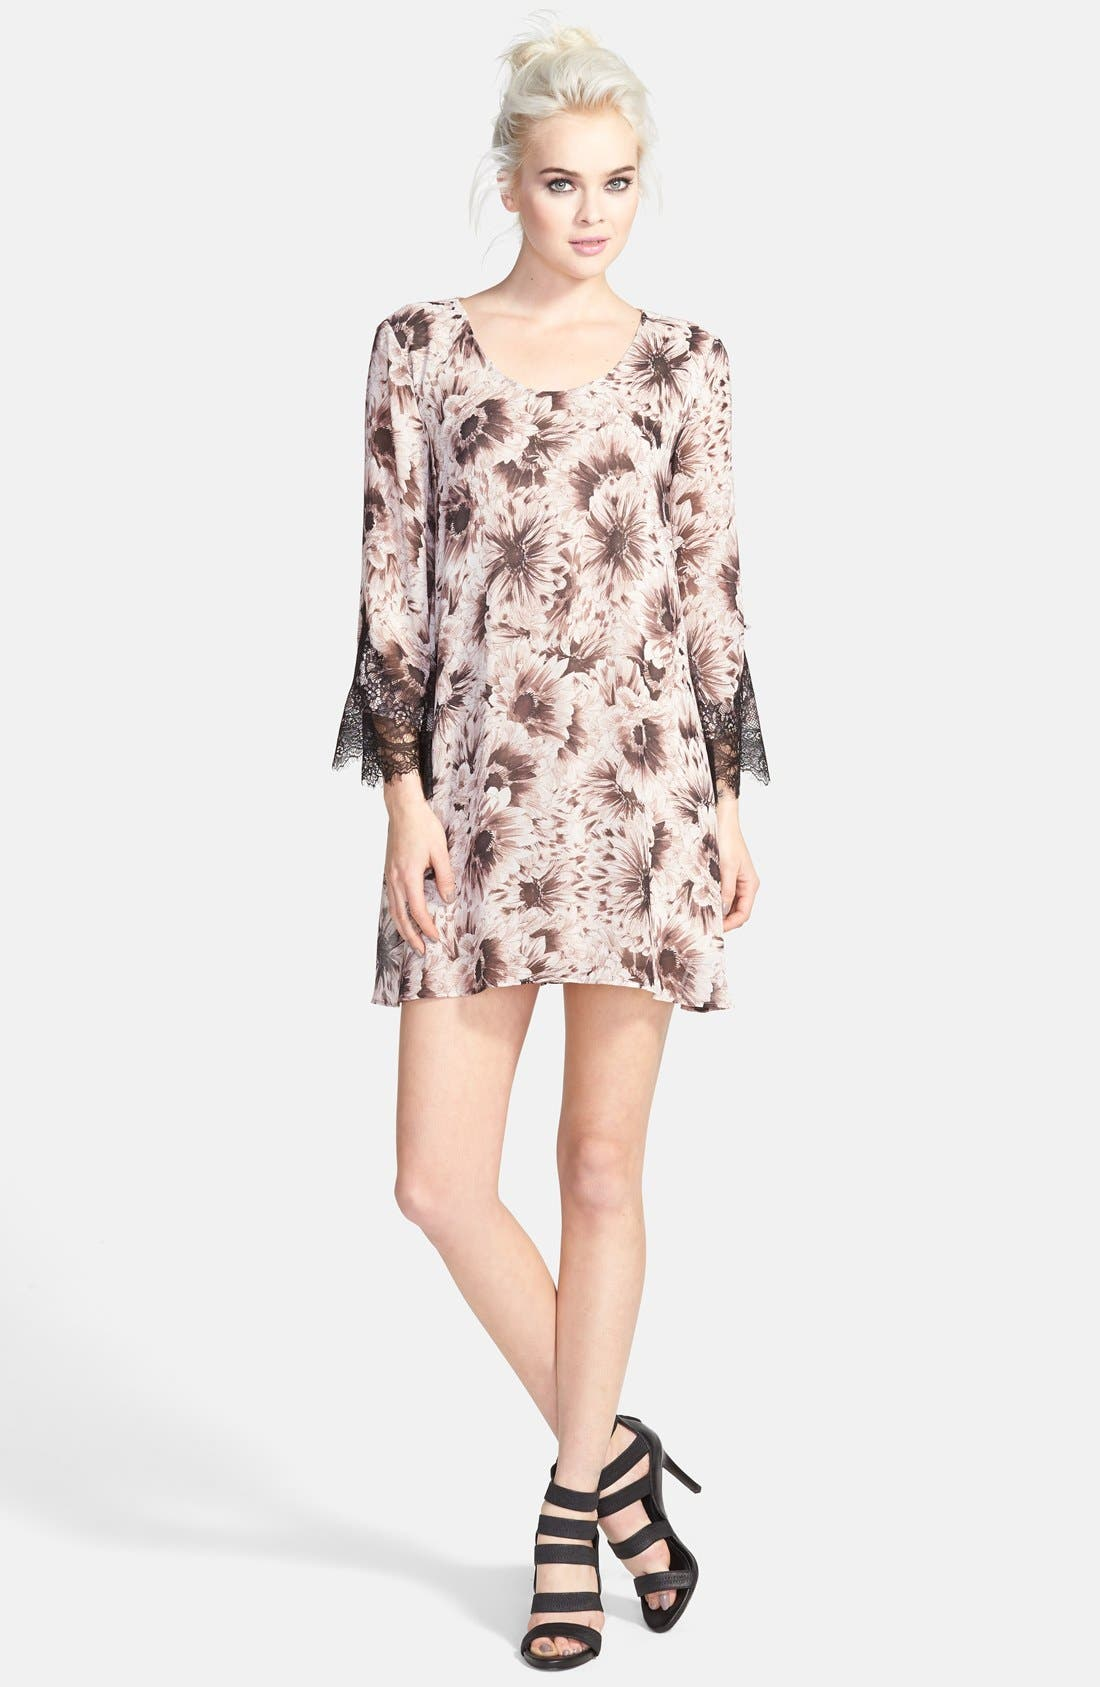 ASTR Lace Sleeve Shift Dress,                             Main thumbnail 1, color,                             Plum/ Black